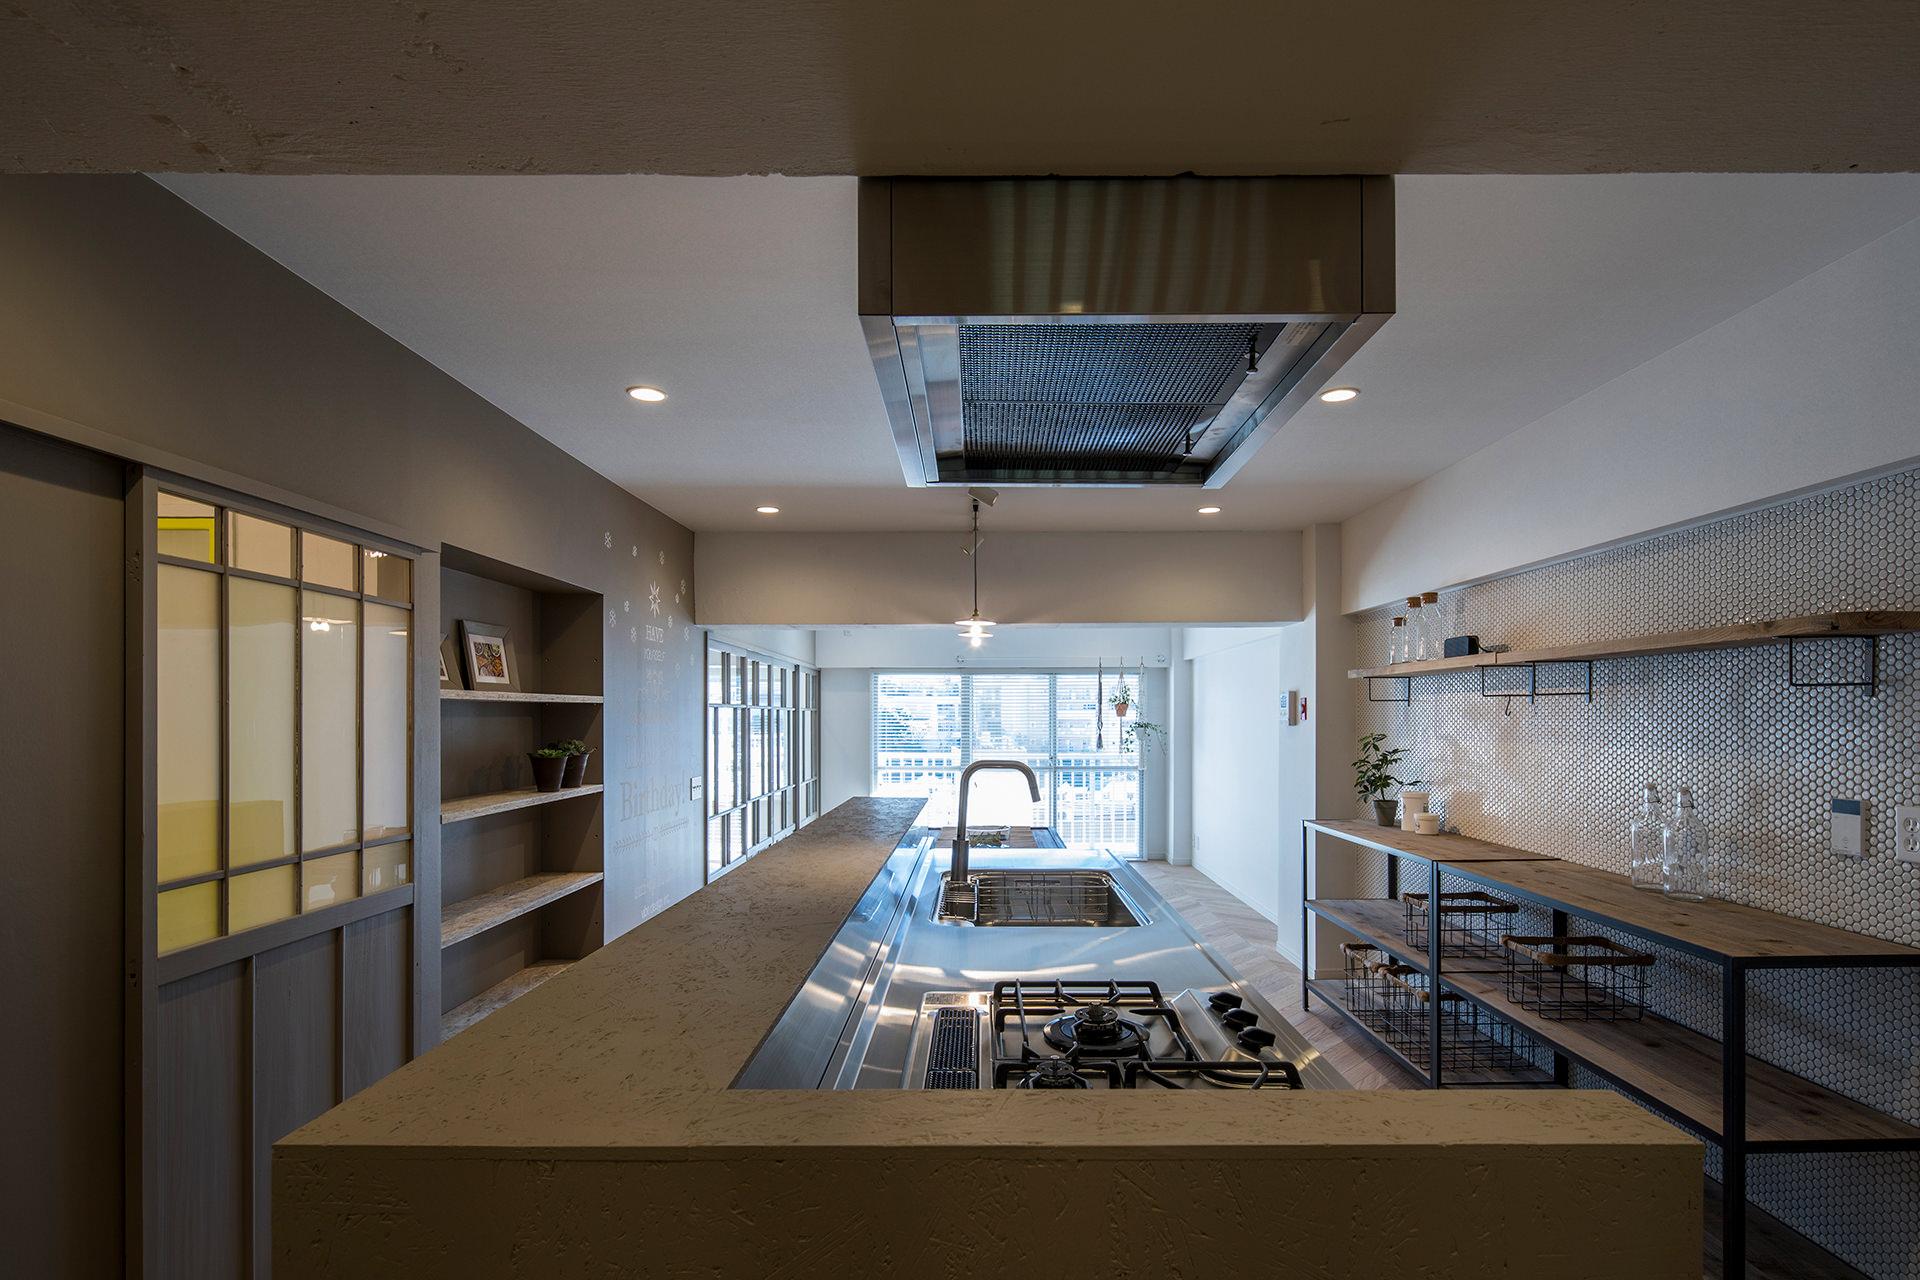 stri-ep house* flat 葉山エコーハイツ  イメージ4 撮影:東涌写真事務所・東涌宏和